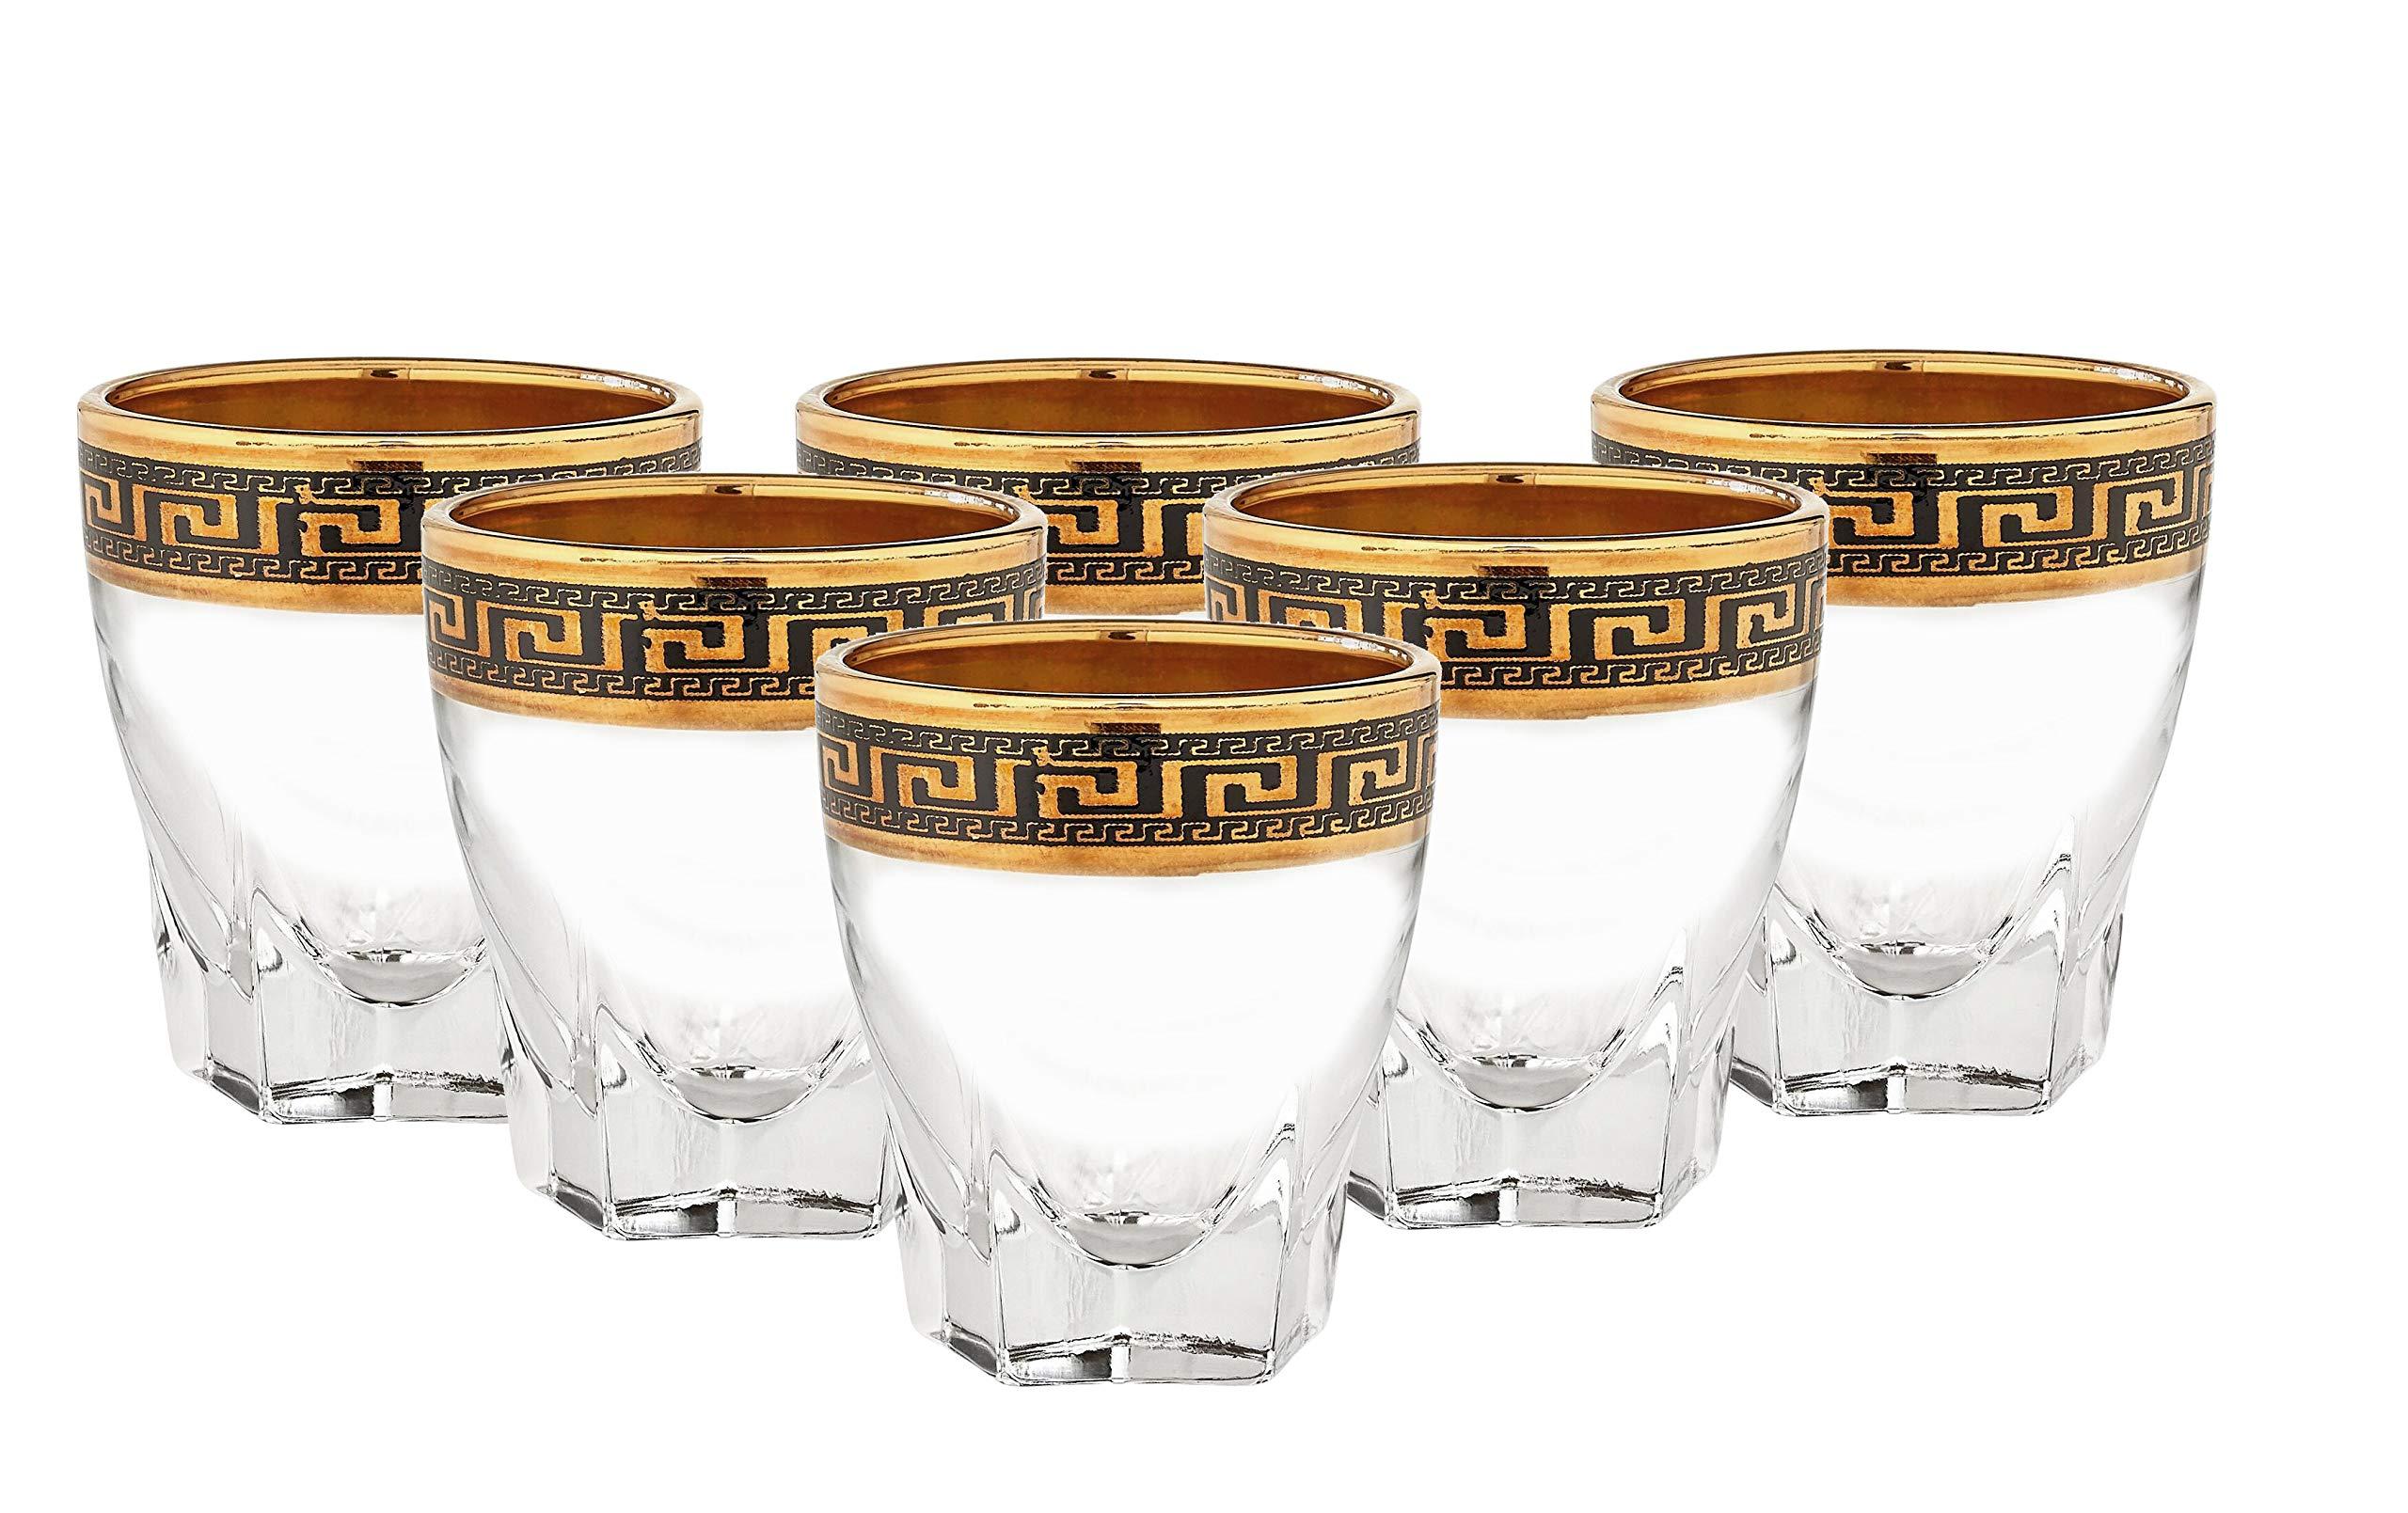 ''Cristalleria Italian Decor'' Crystal Shot Liquor Glasses Shooters, 2.5 oz. 24K Gold Rimmed Greek Key Ornament, Hand Made in Italy, SET OF 6